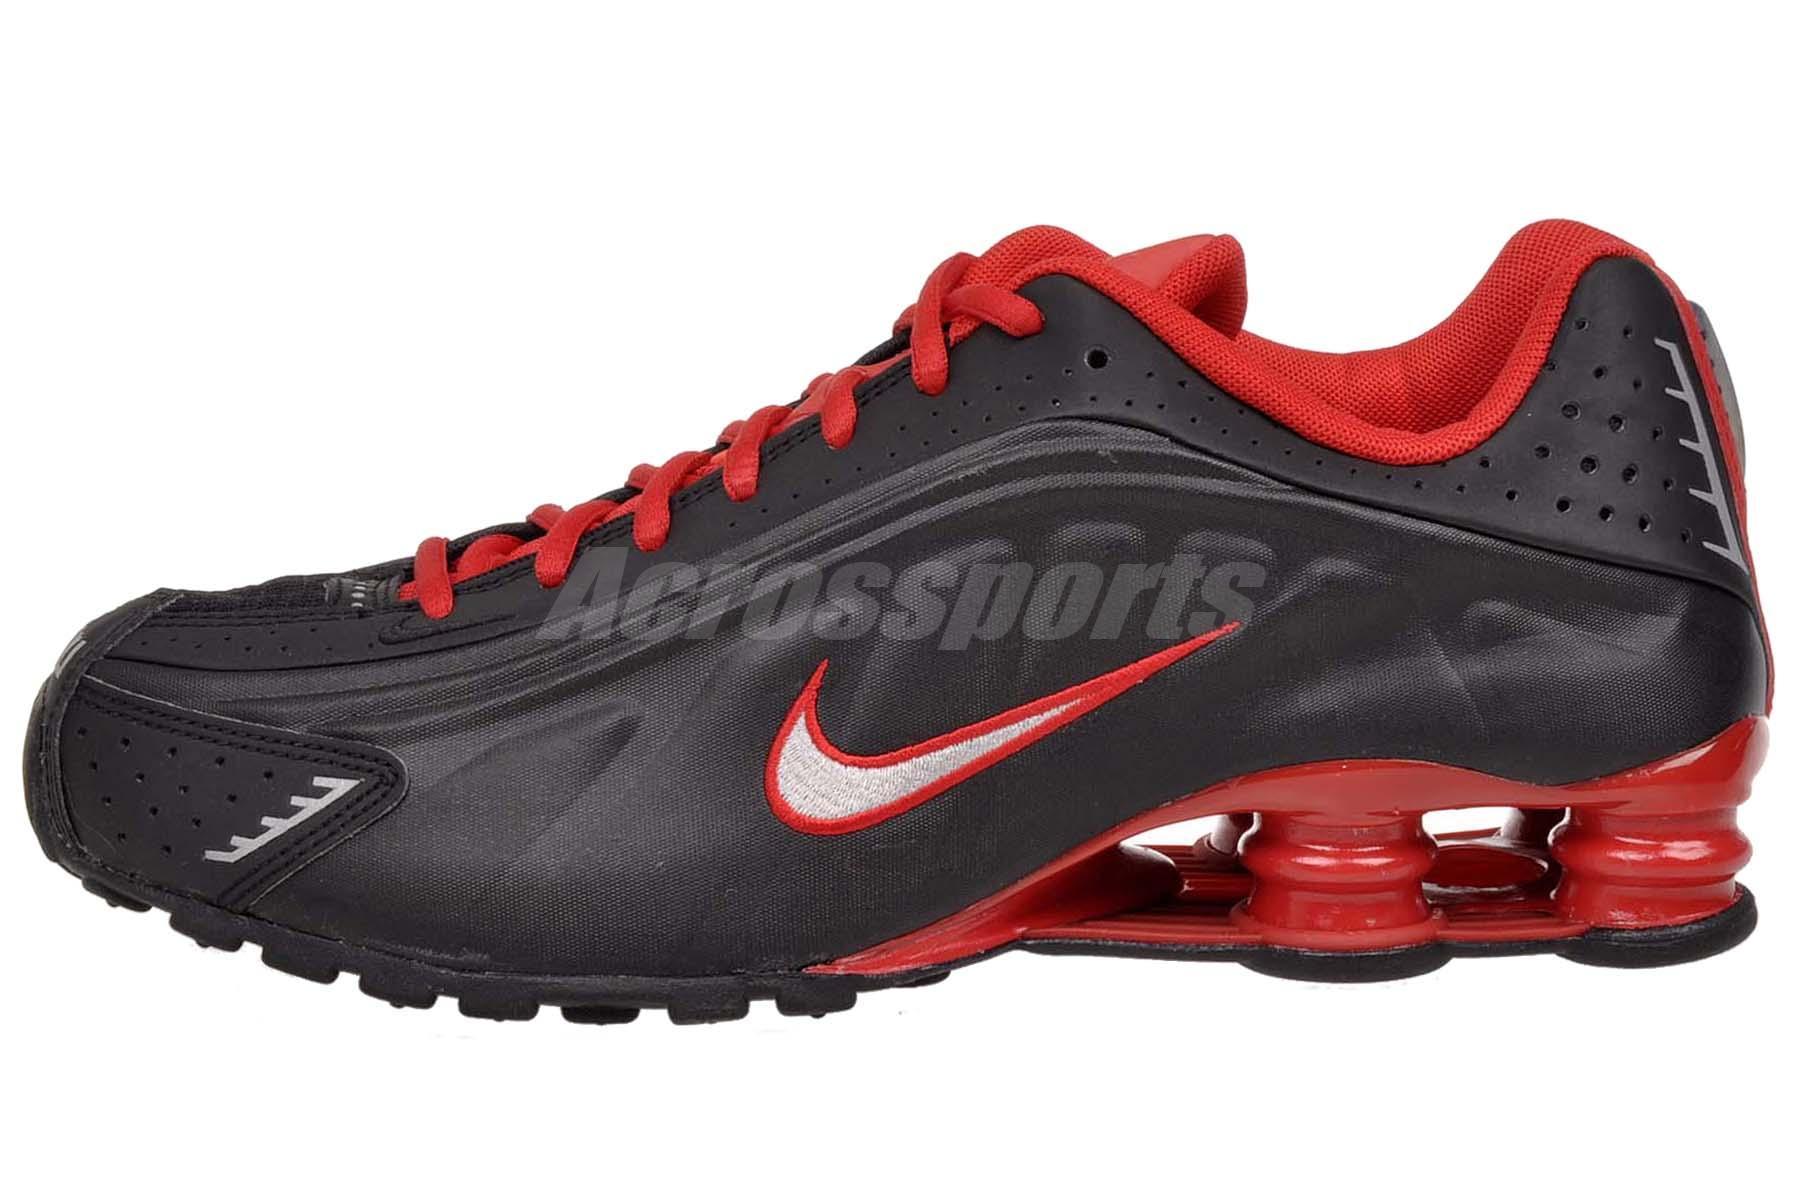 huge discount 82fd9 f83a9 black red shox r4 mens nike